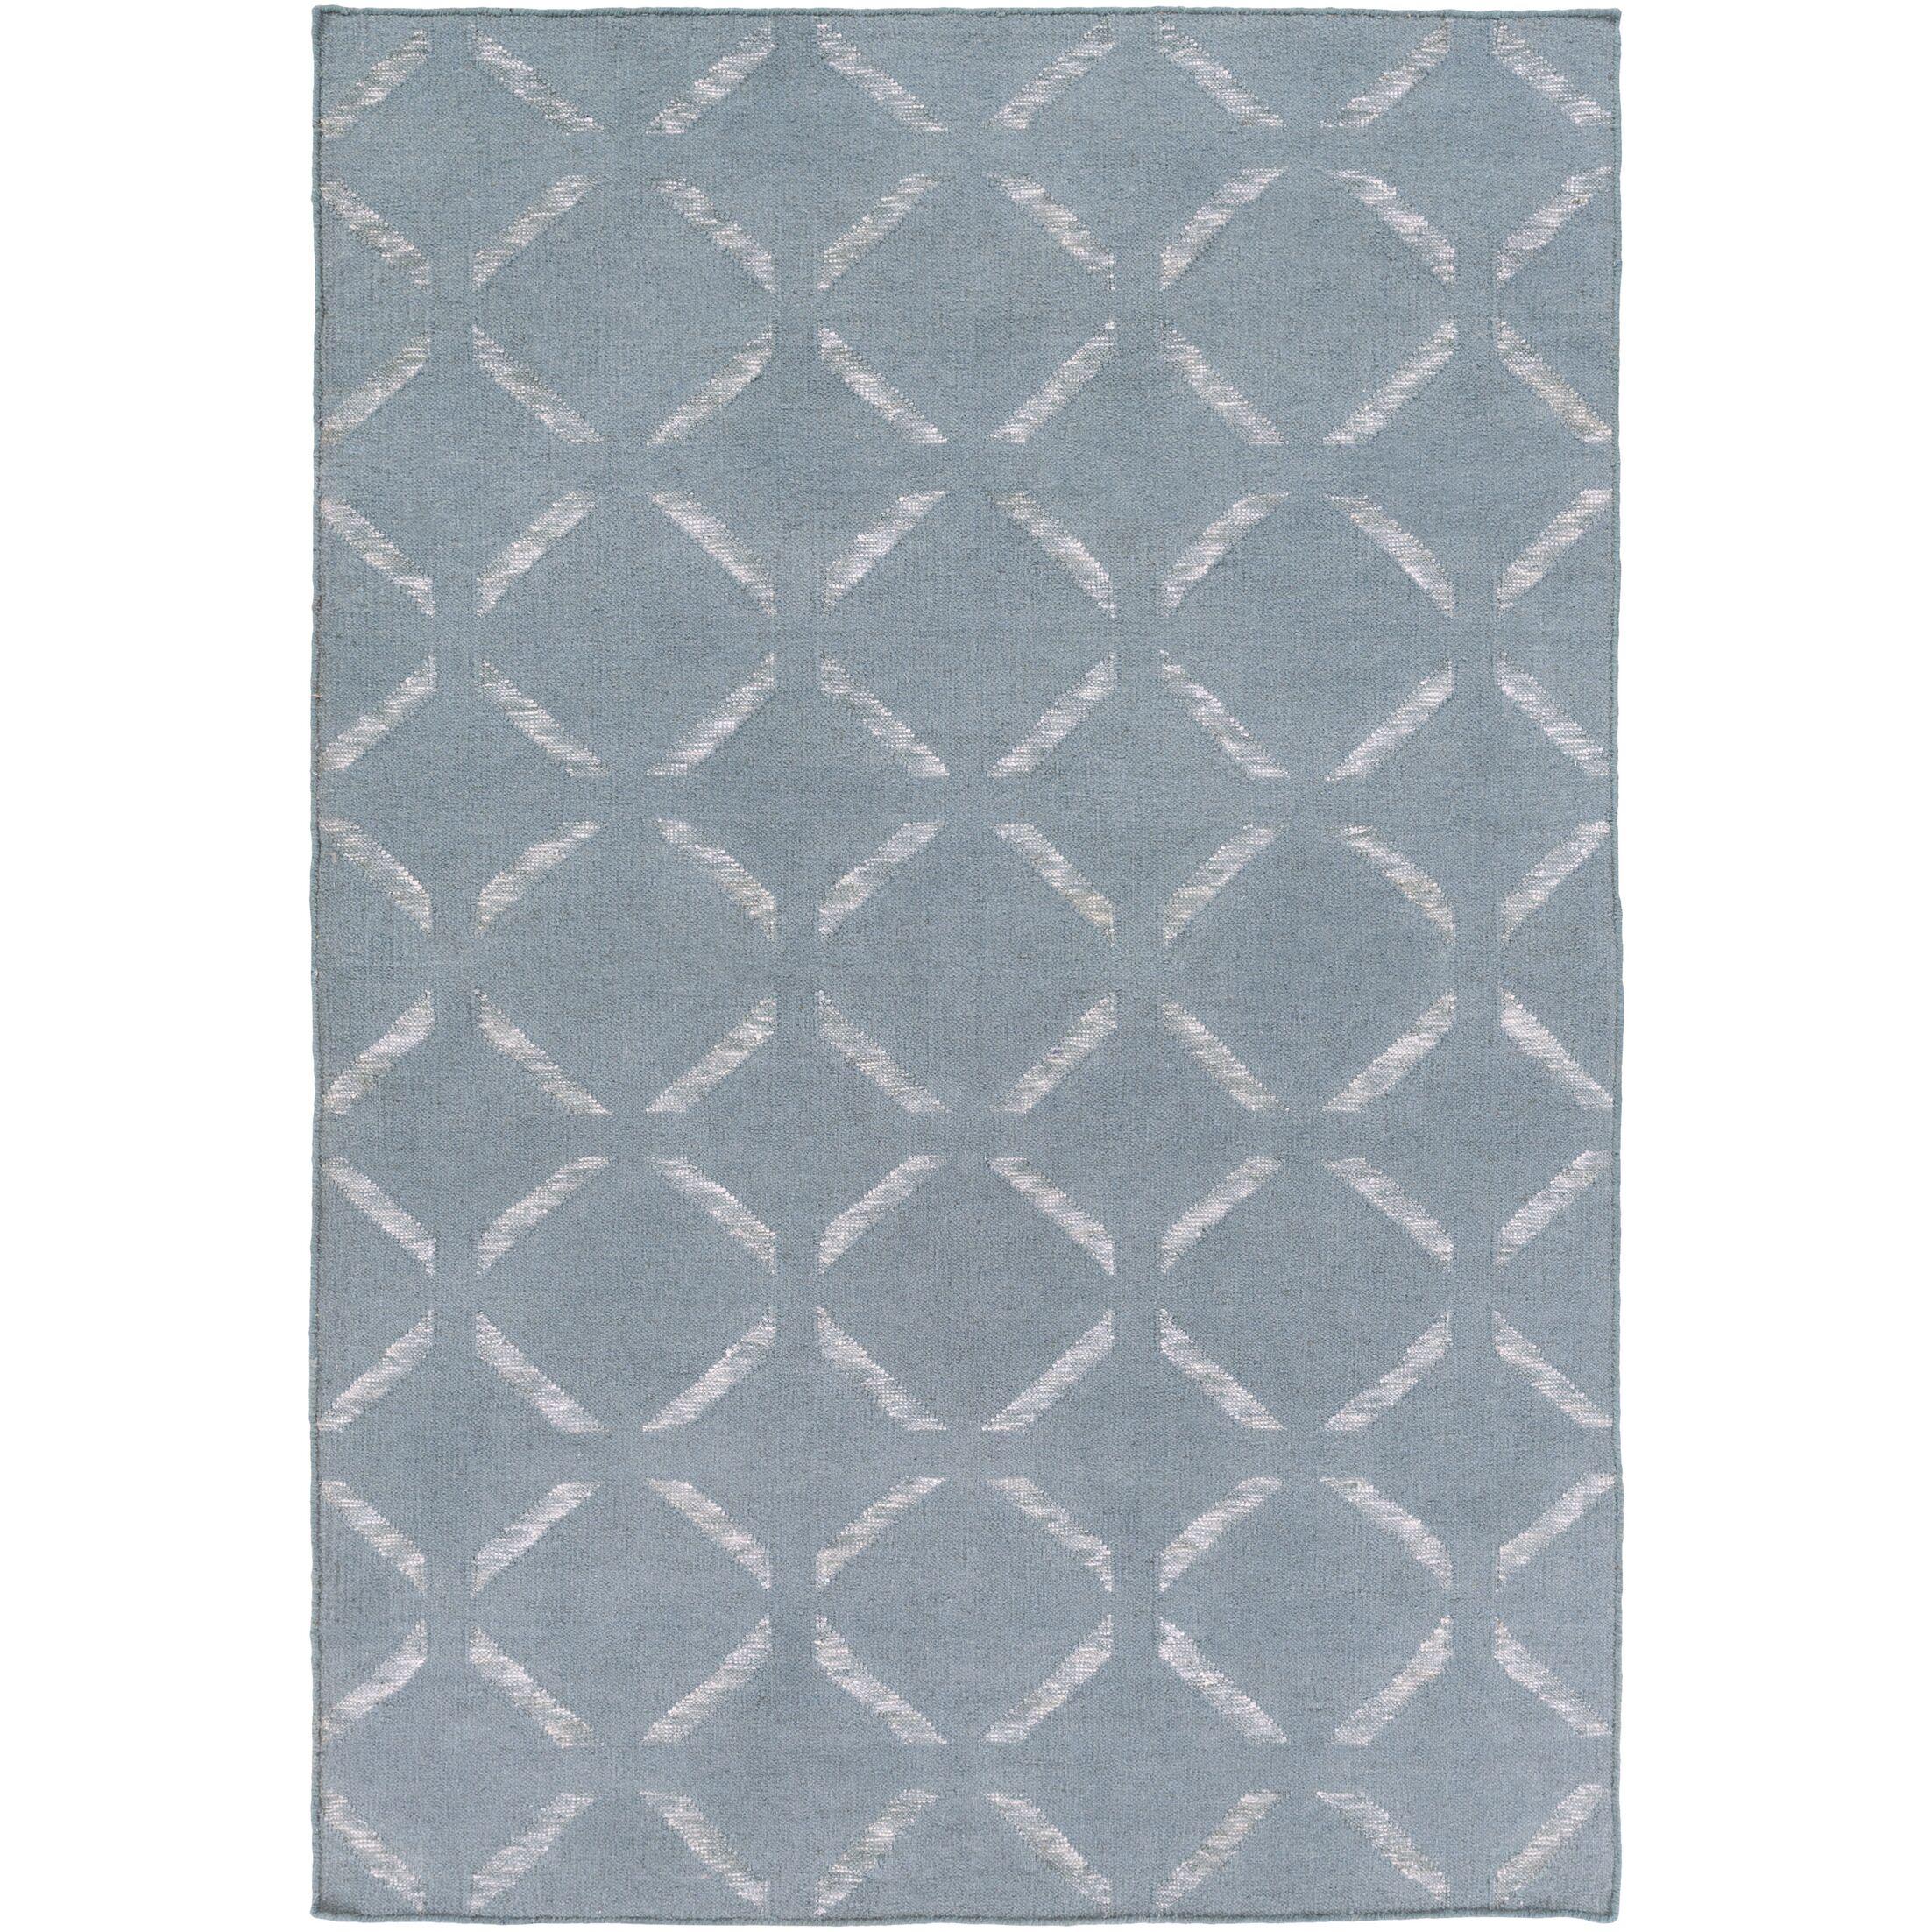 Chesterton Hand Woven Blue Area Rug Rug Size: Rectangle 4' x 6'